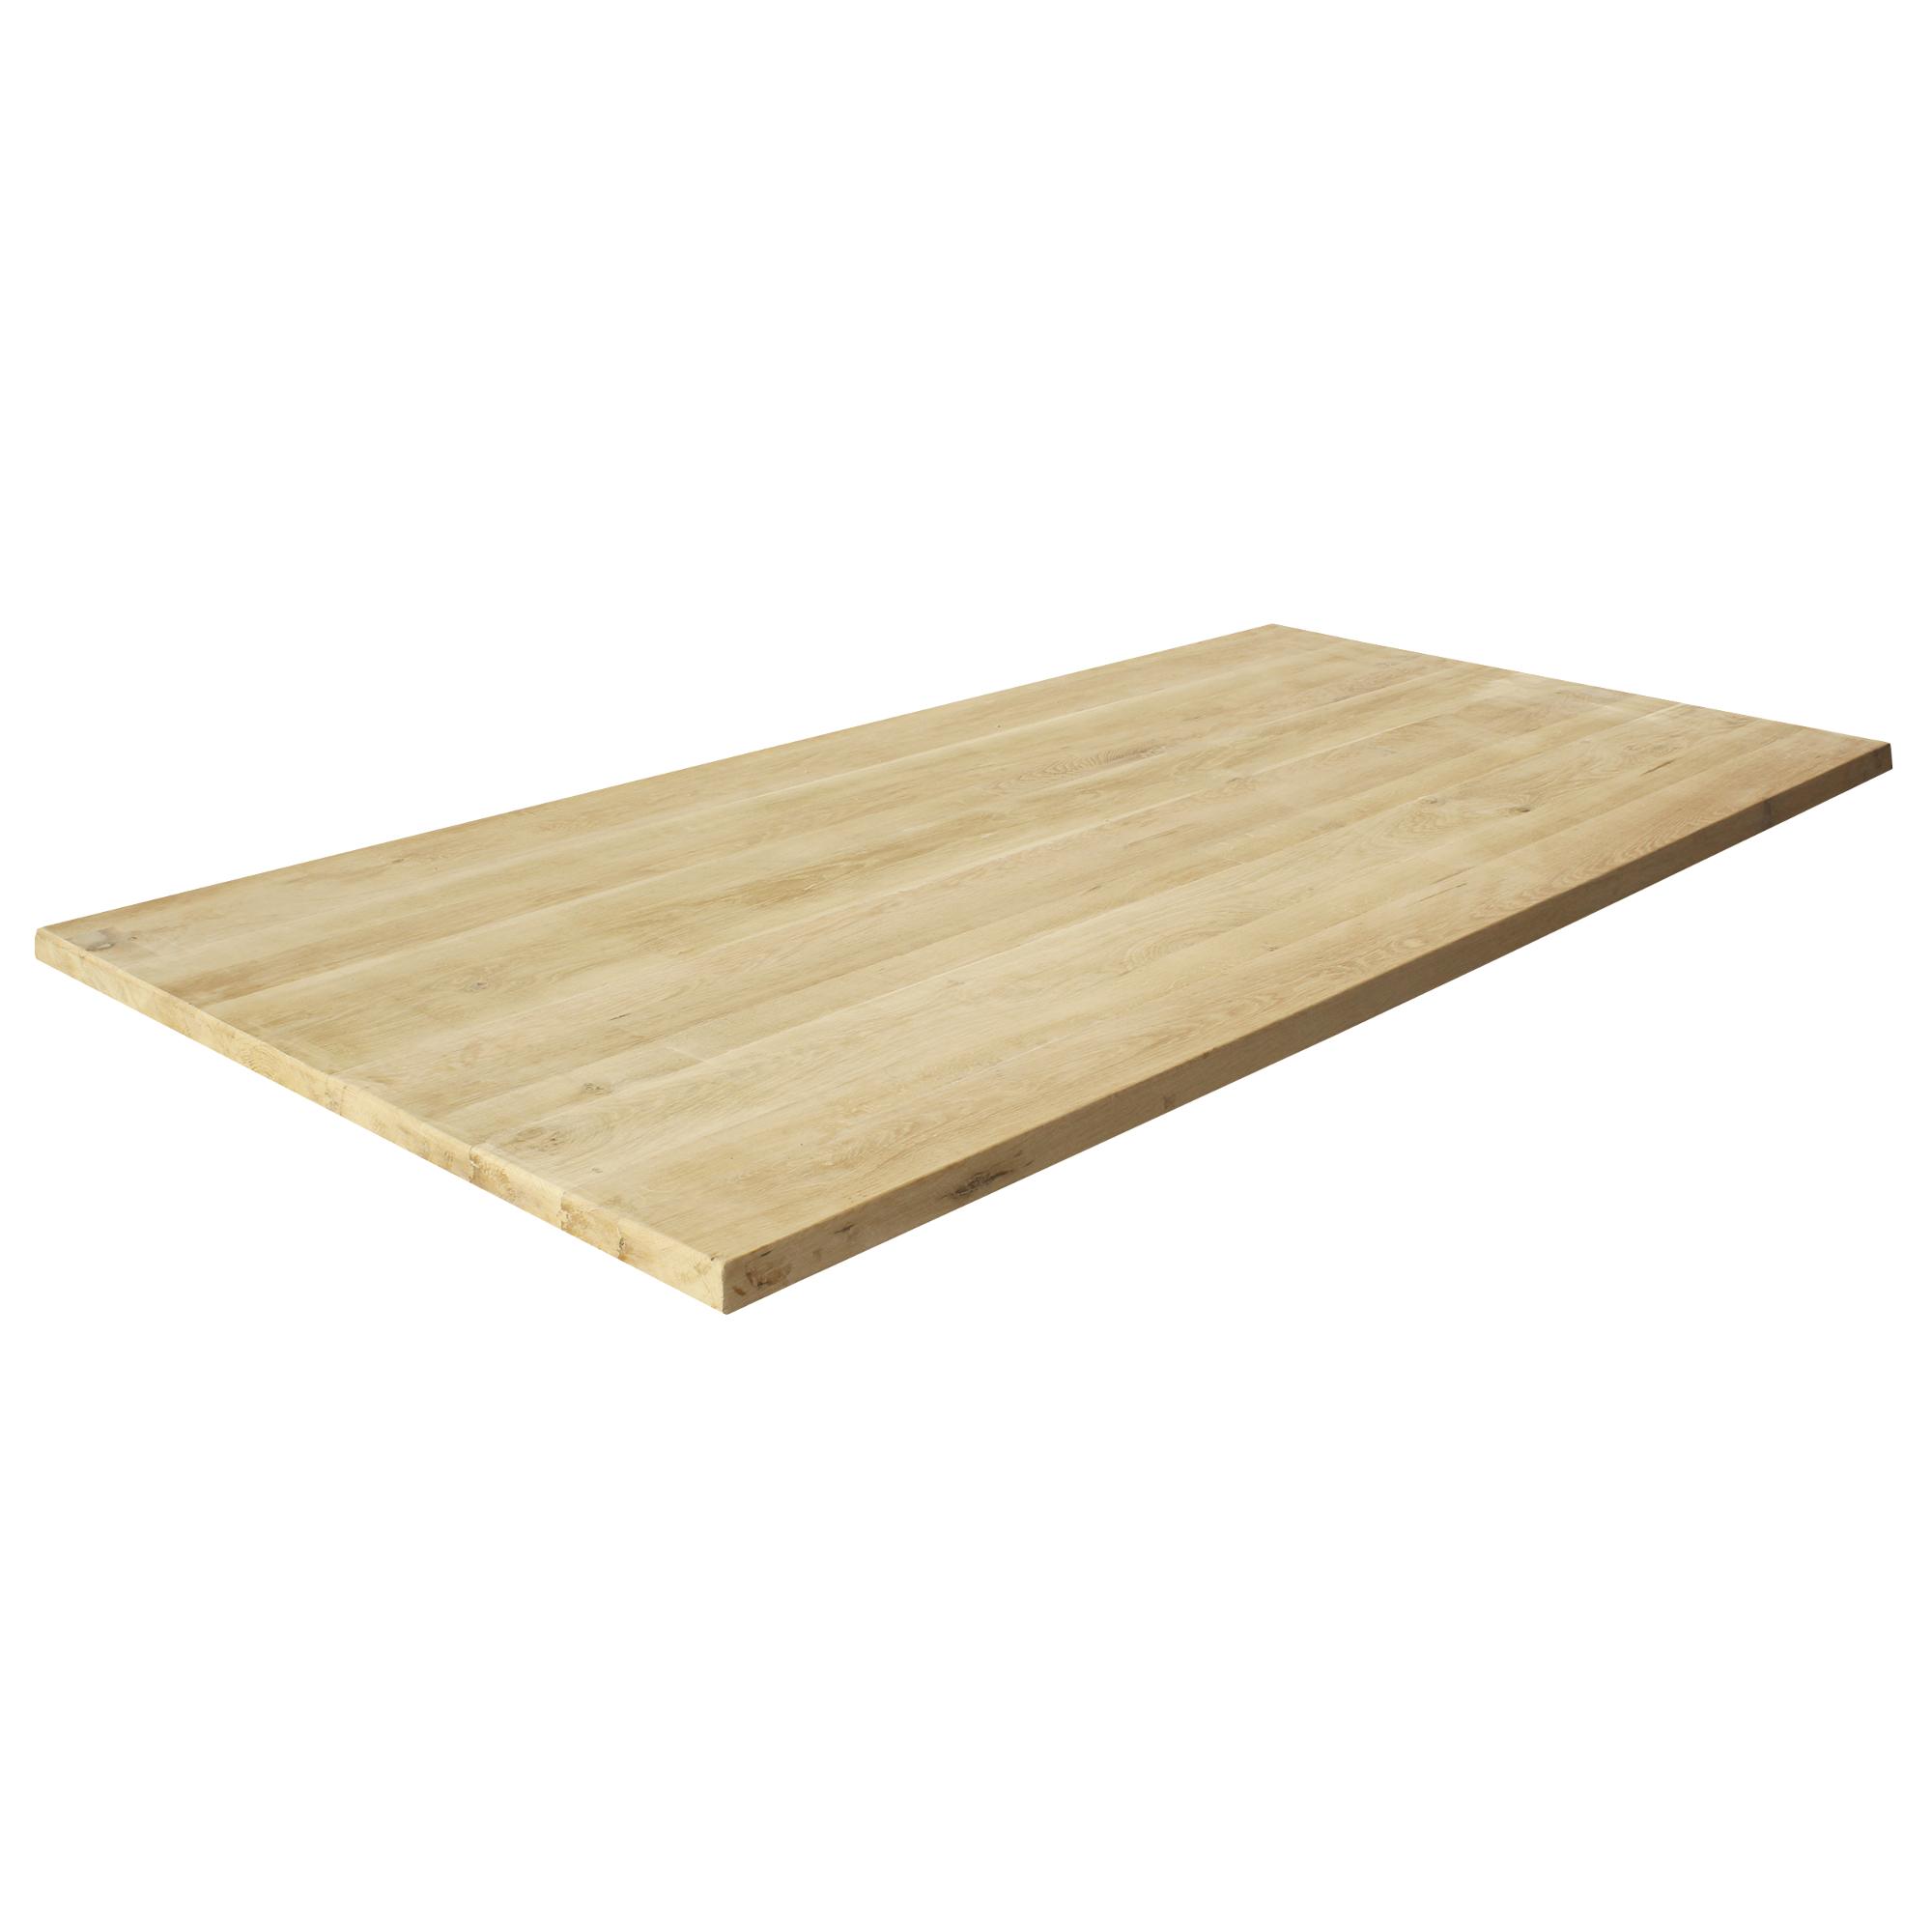 tischplatte eichenholz massivholzplatte eiche massiv holz diy 200x100cm ebay. Black Bedroom Furniture Sets. Home Design Ideas